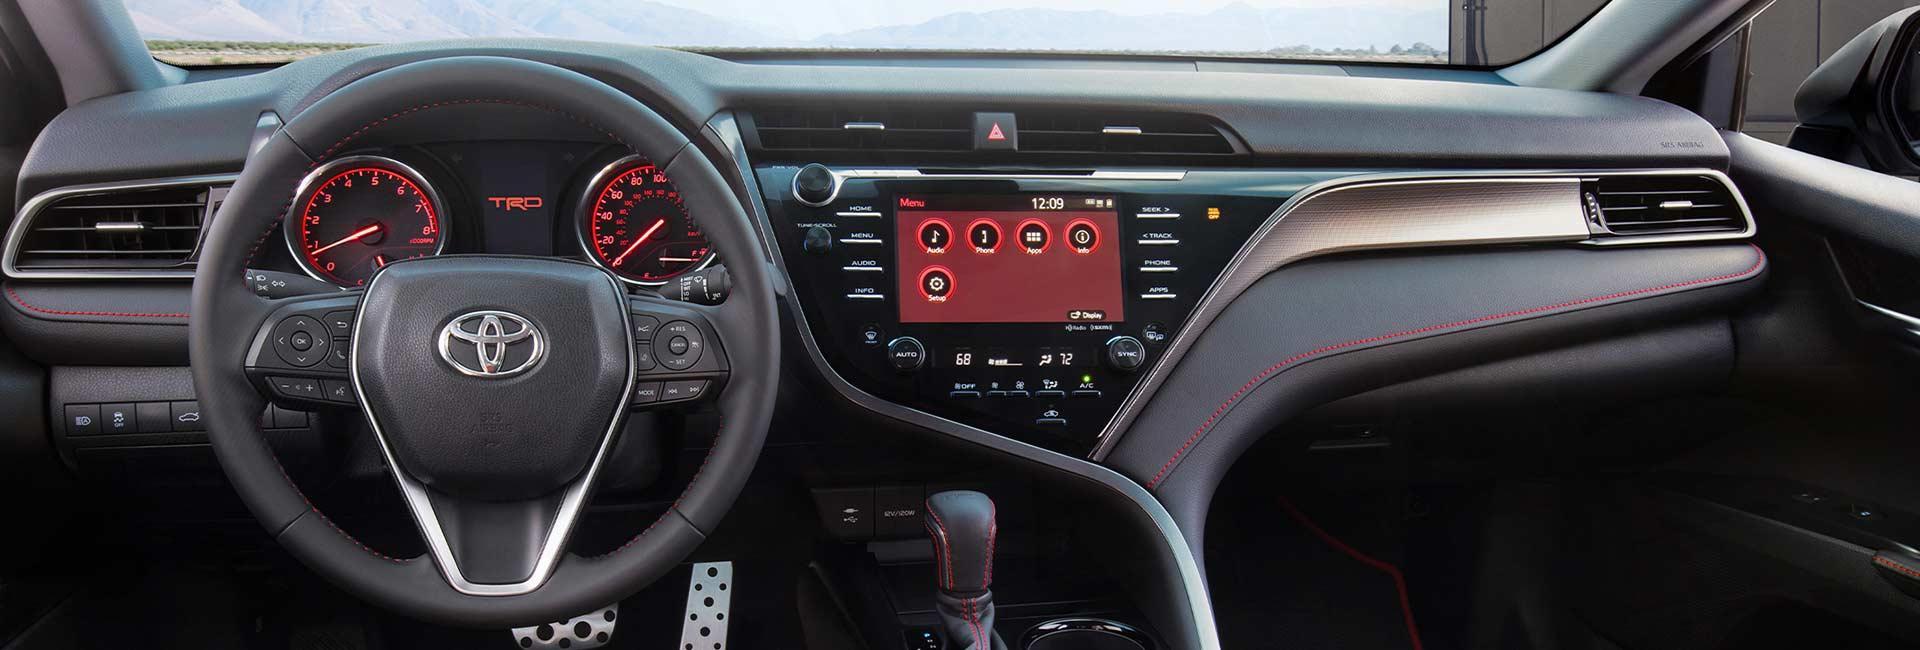 I2021 Toyota Camry  infotainment system